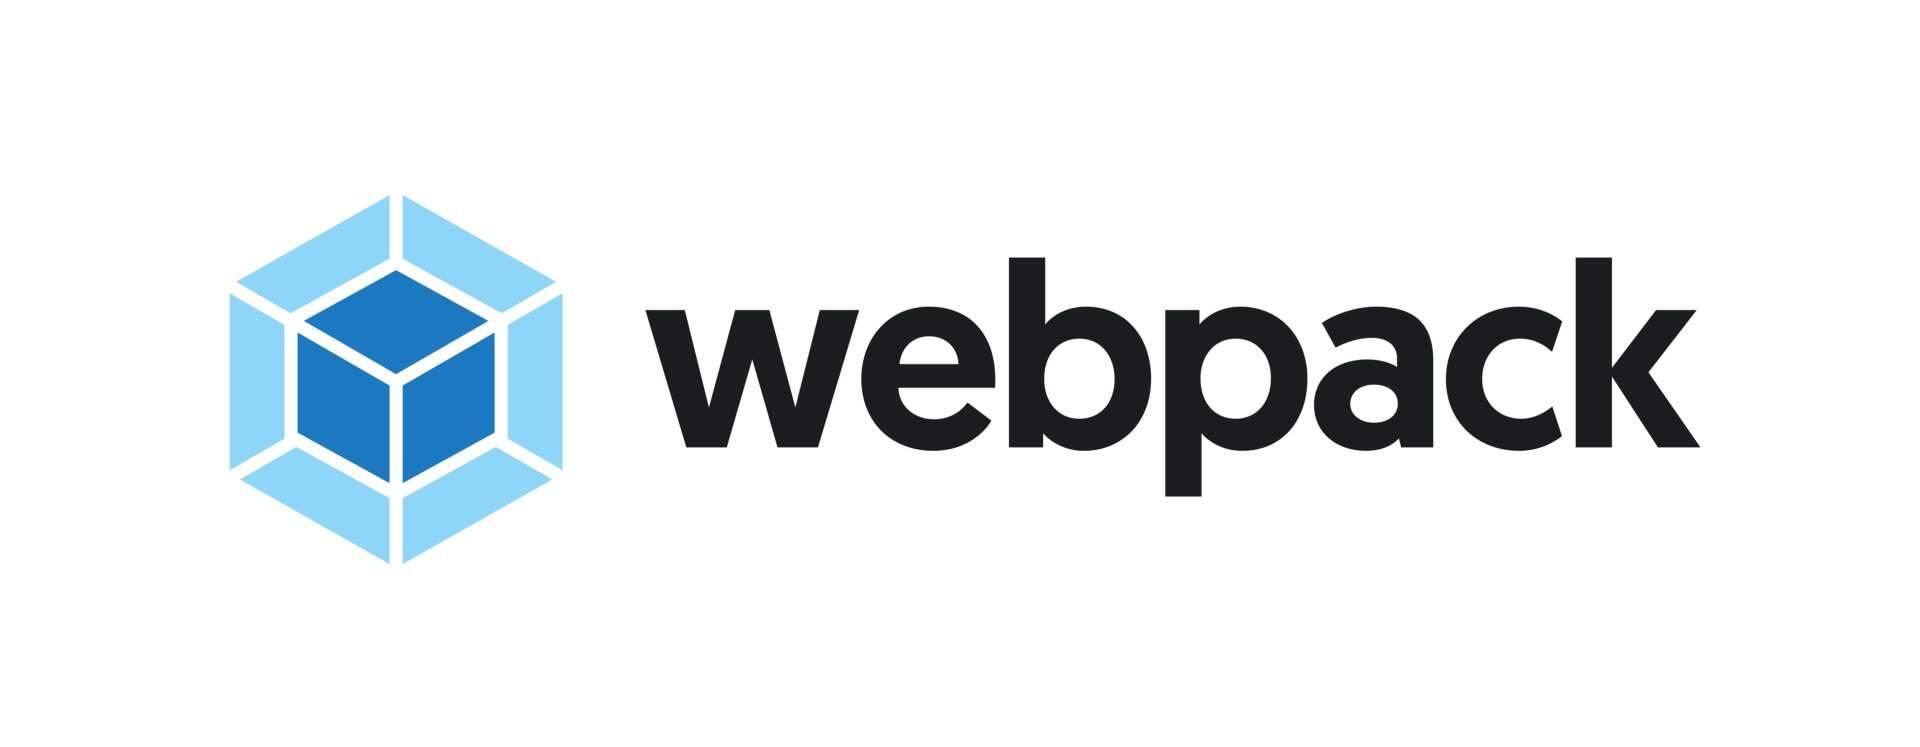 【webpack系列一】如何写一个自己的loader